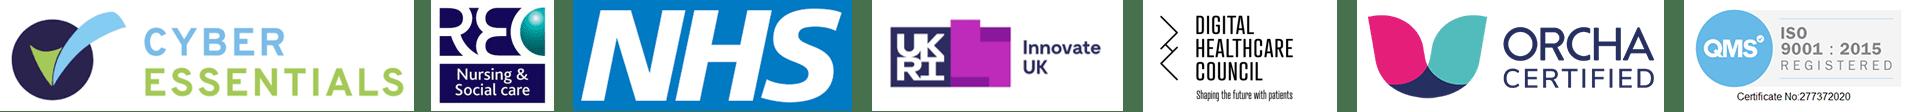 CheckUp-Health-Website-Logos-3-min